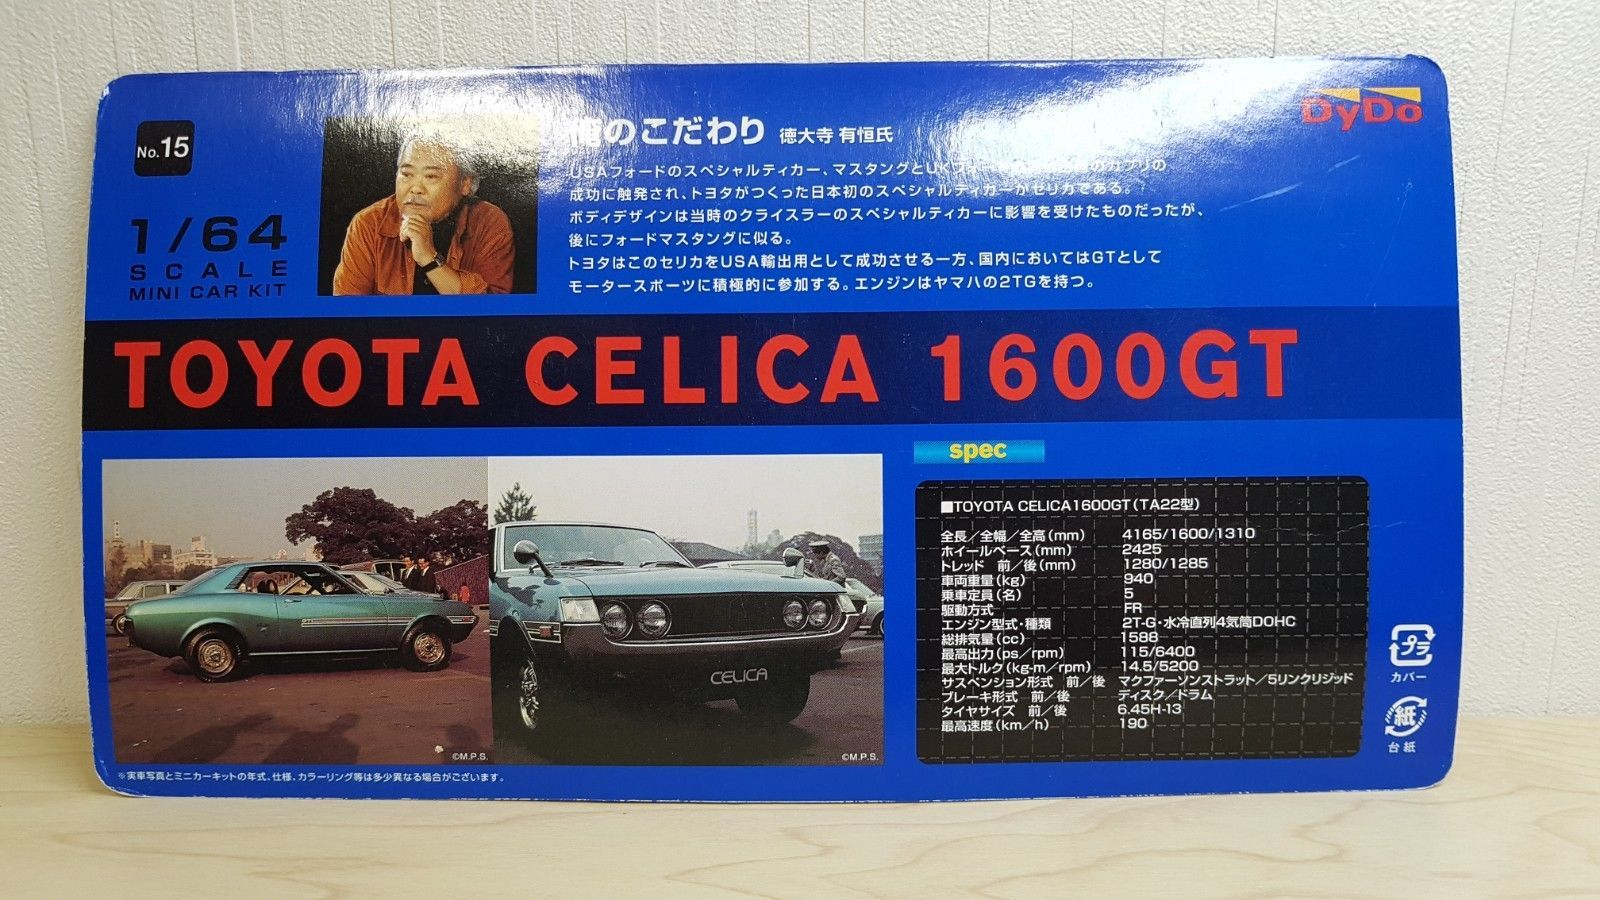 1/64 Konami Dydo TOYOTA CELICA 1600GT BLUE diecast car model kit NEW